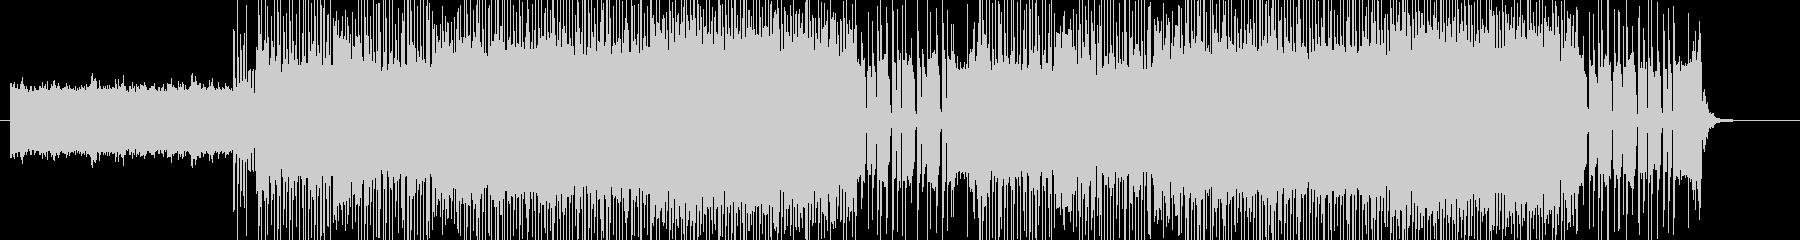 「HR/HM」「DARK系」BGM18の未再生の波形